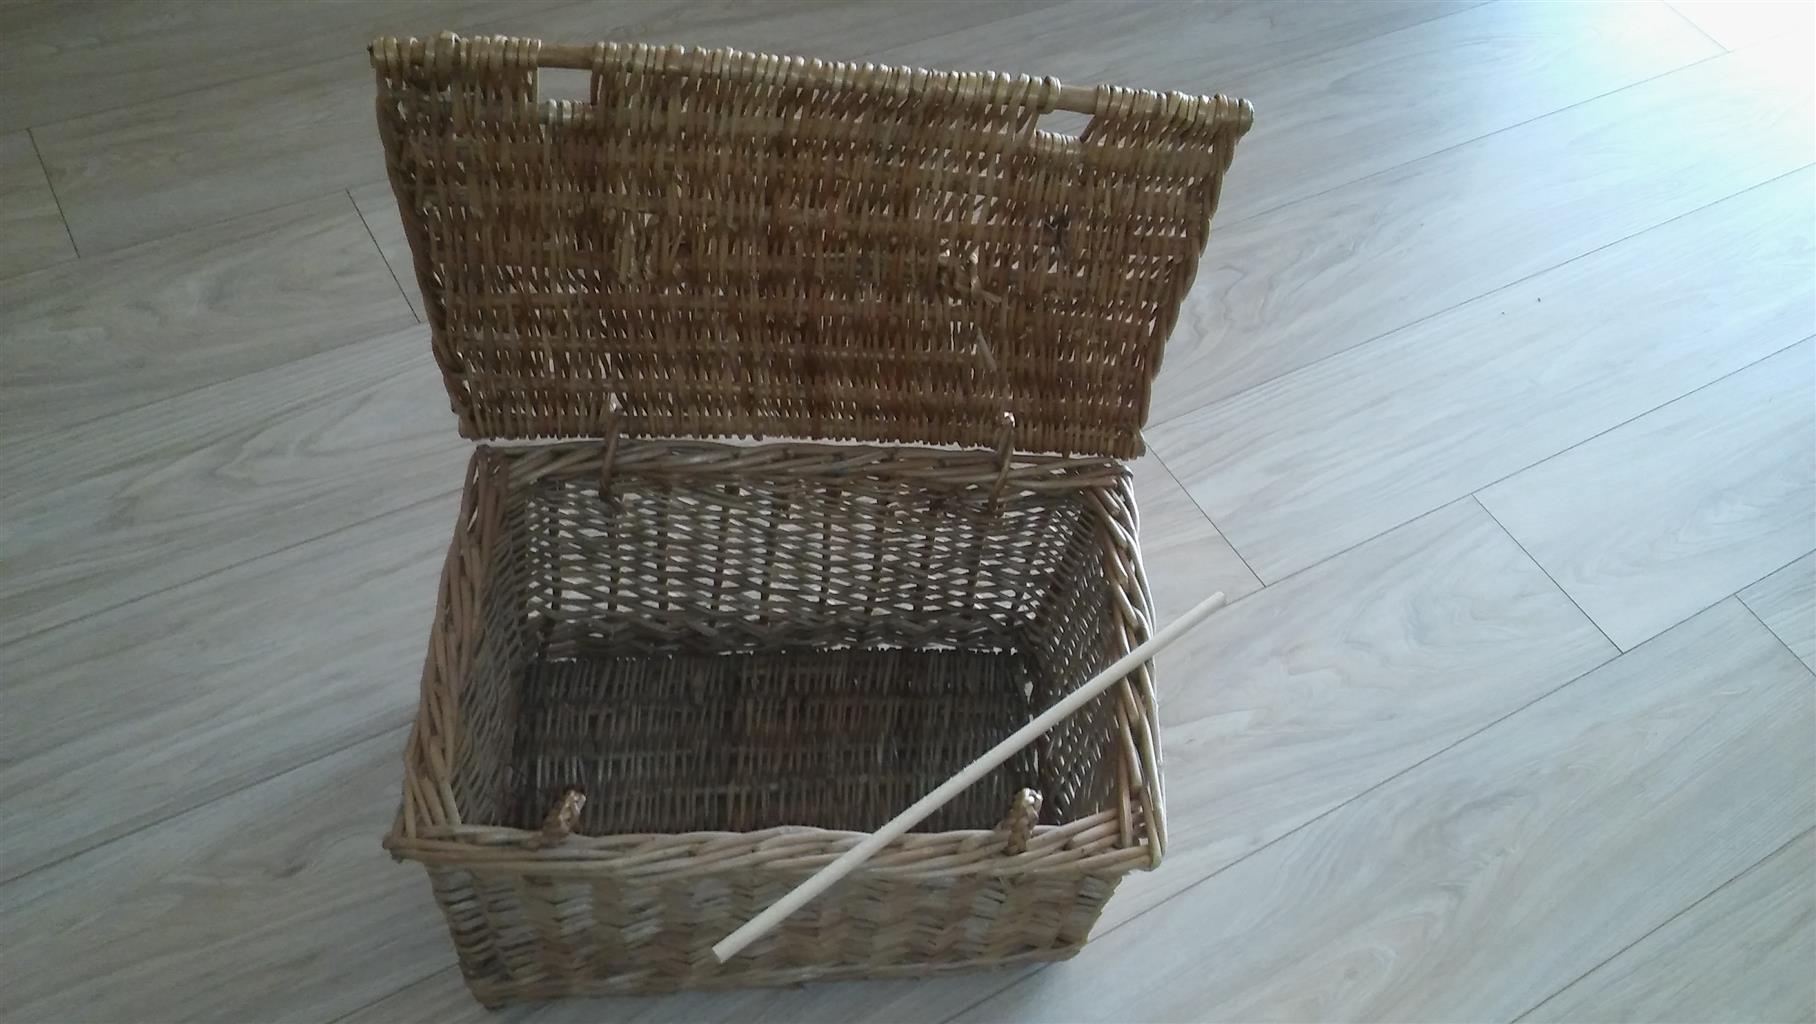 Cane Picnic basket